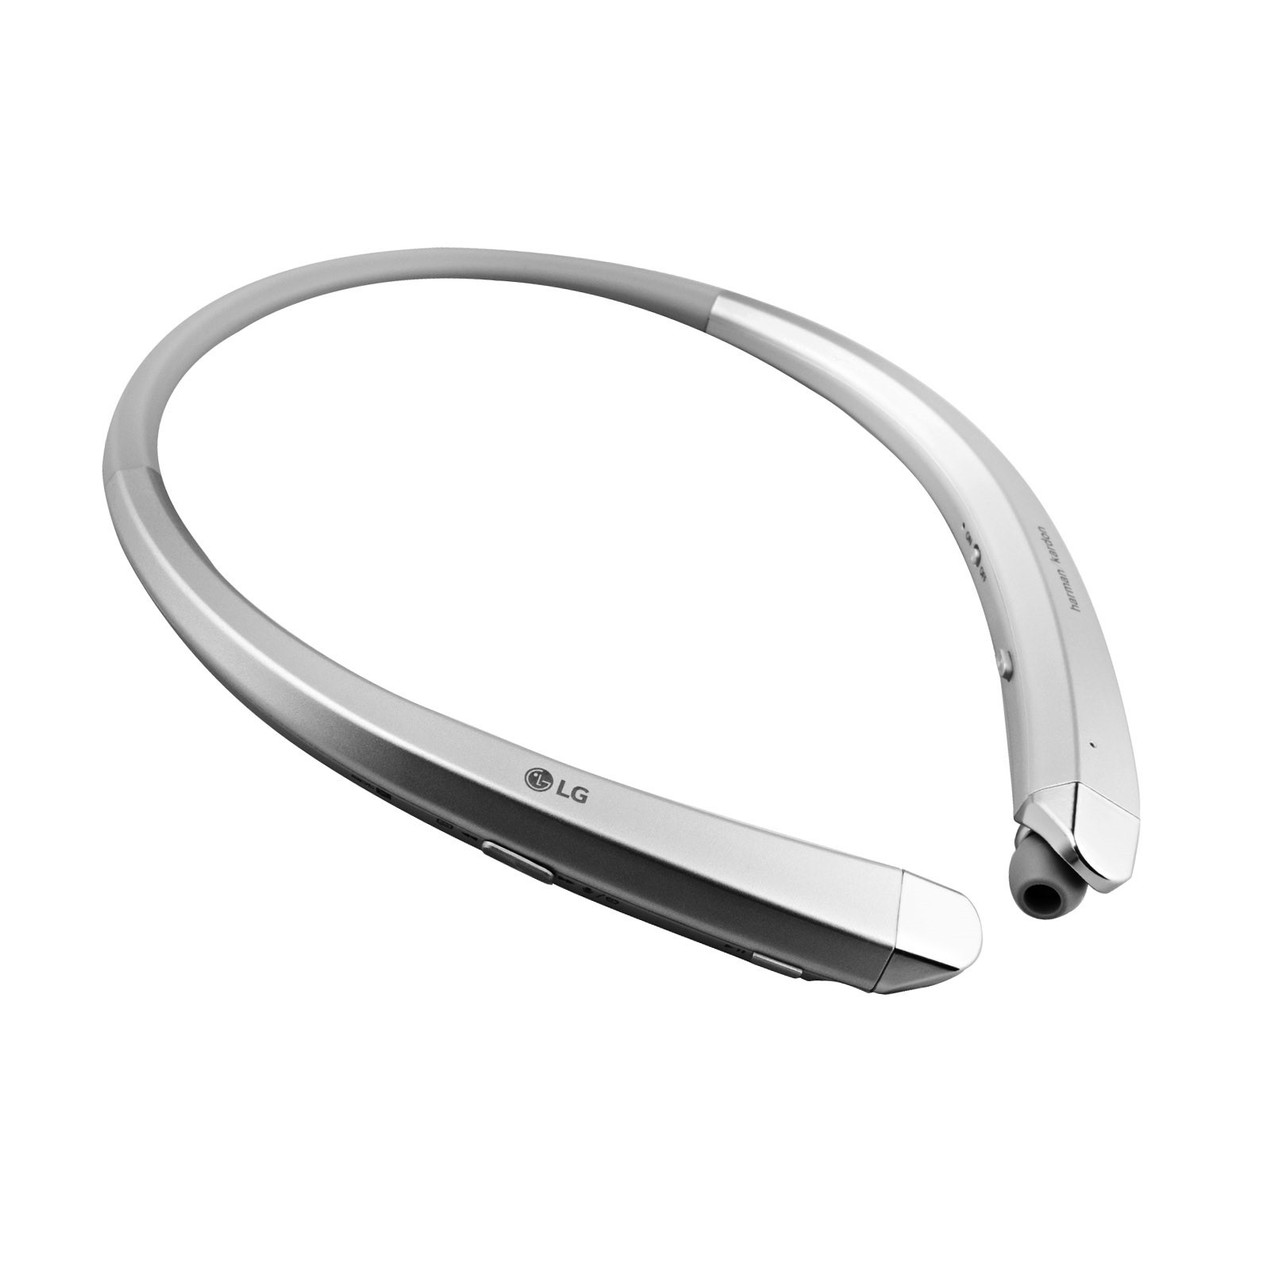 e6861b80bb5 LG HBS-910 Tone Infinim Wireless Bluetooth Stereo Headset - Tanga